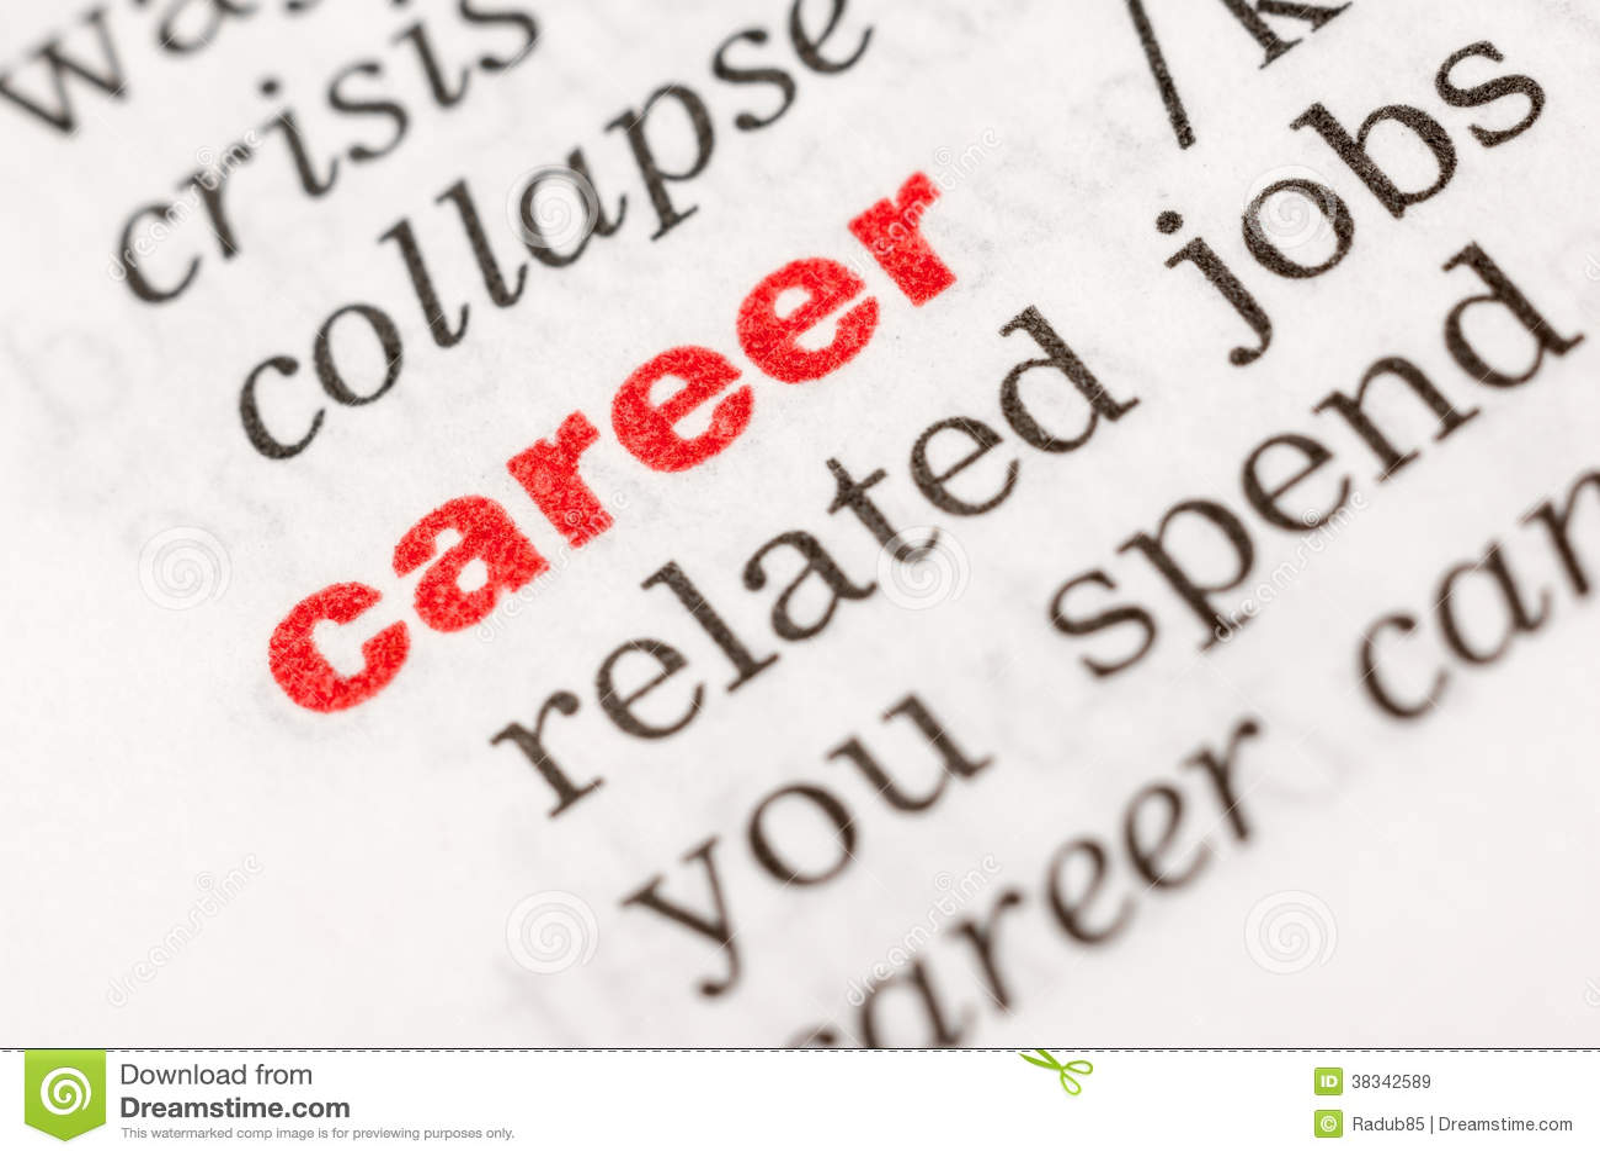 career define doc tk career define 17 04 2017